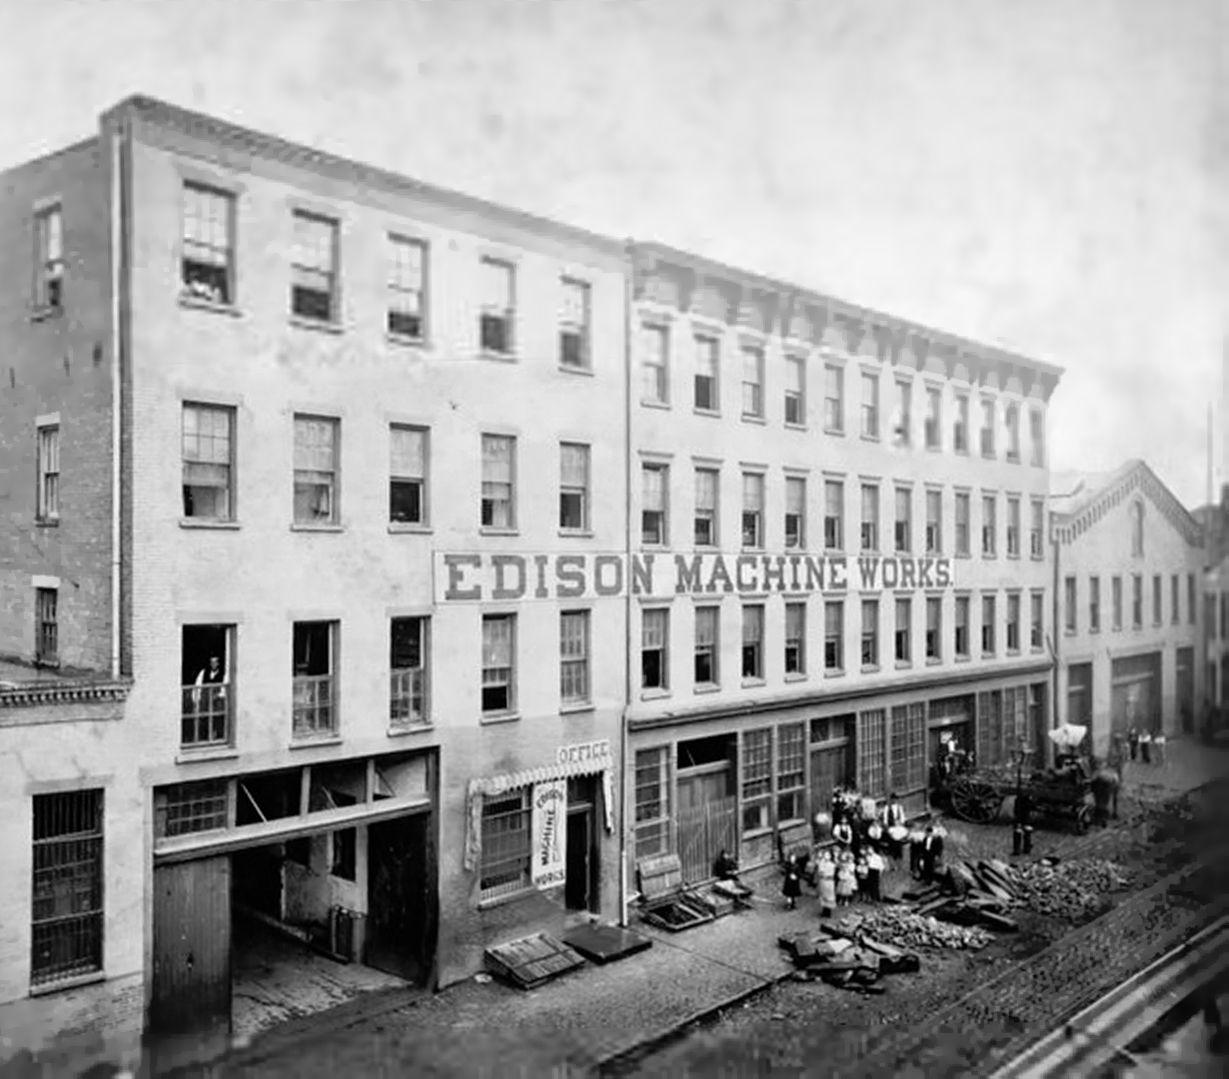 Edison Machine Works in New York City, 1881